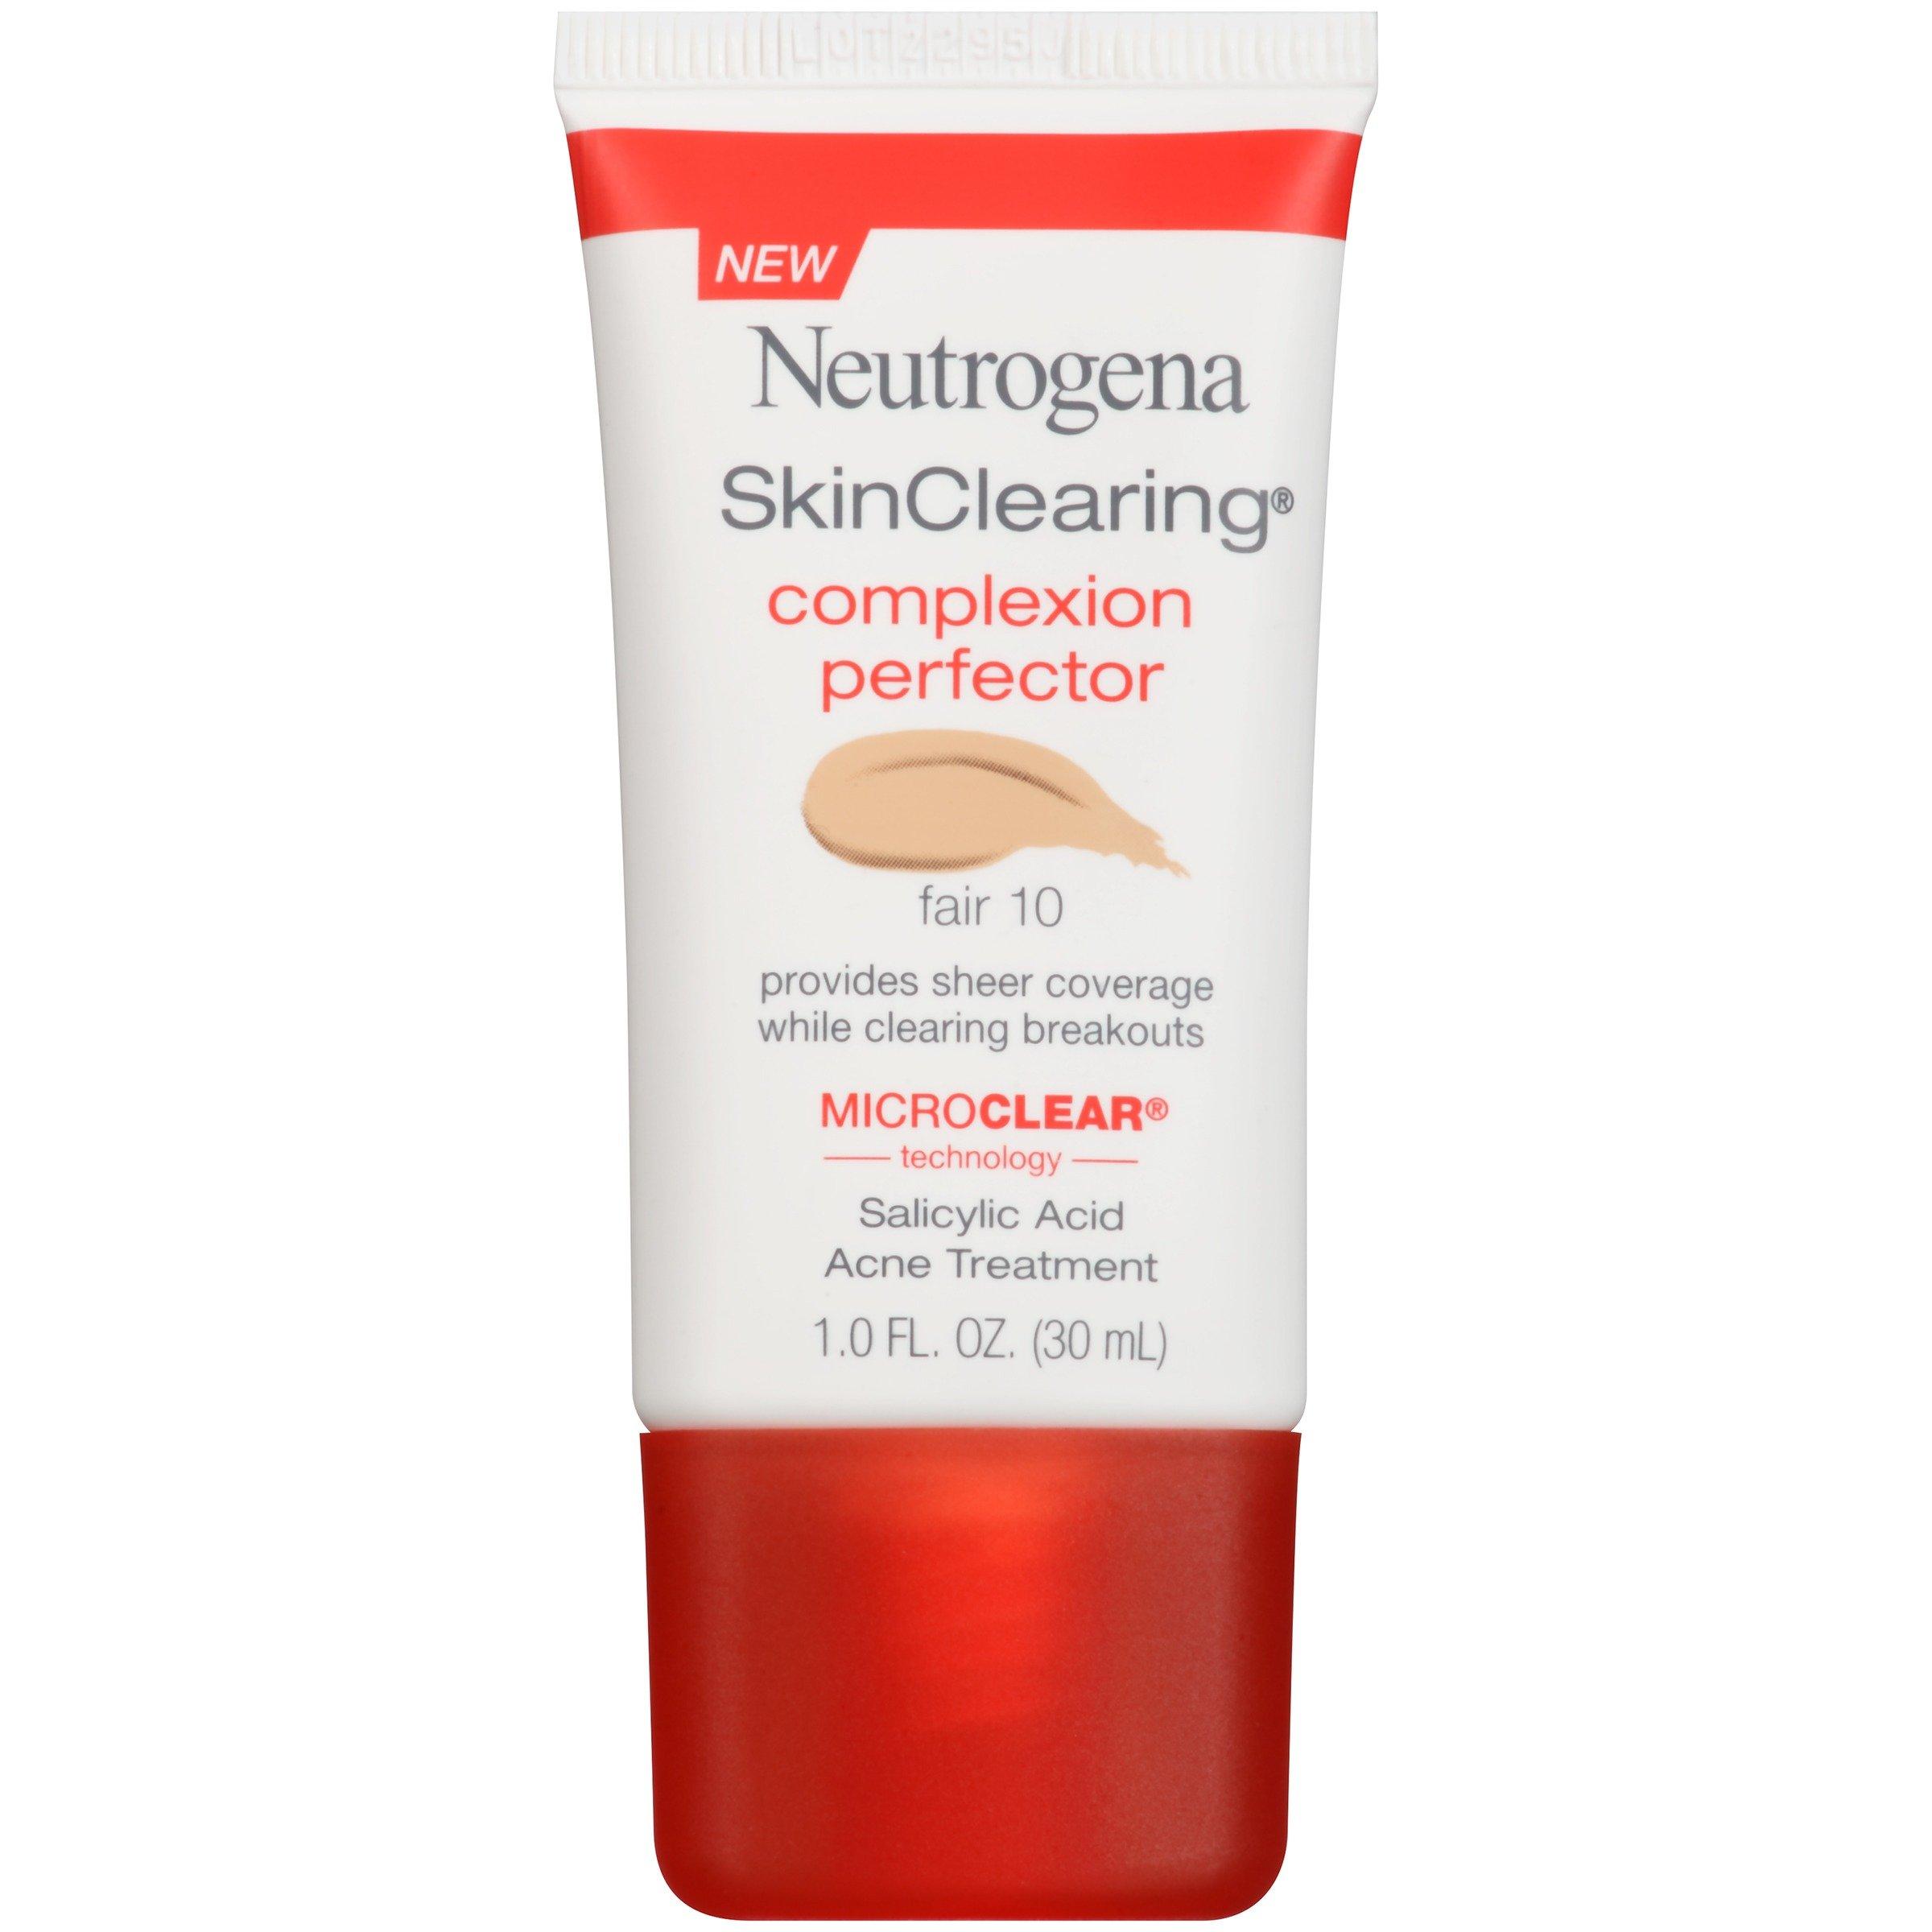 Neutrogena Skinclearing Complexion Perfector With Salicylic Acid, Fair, 1 Fl. Oz.